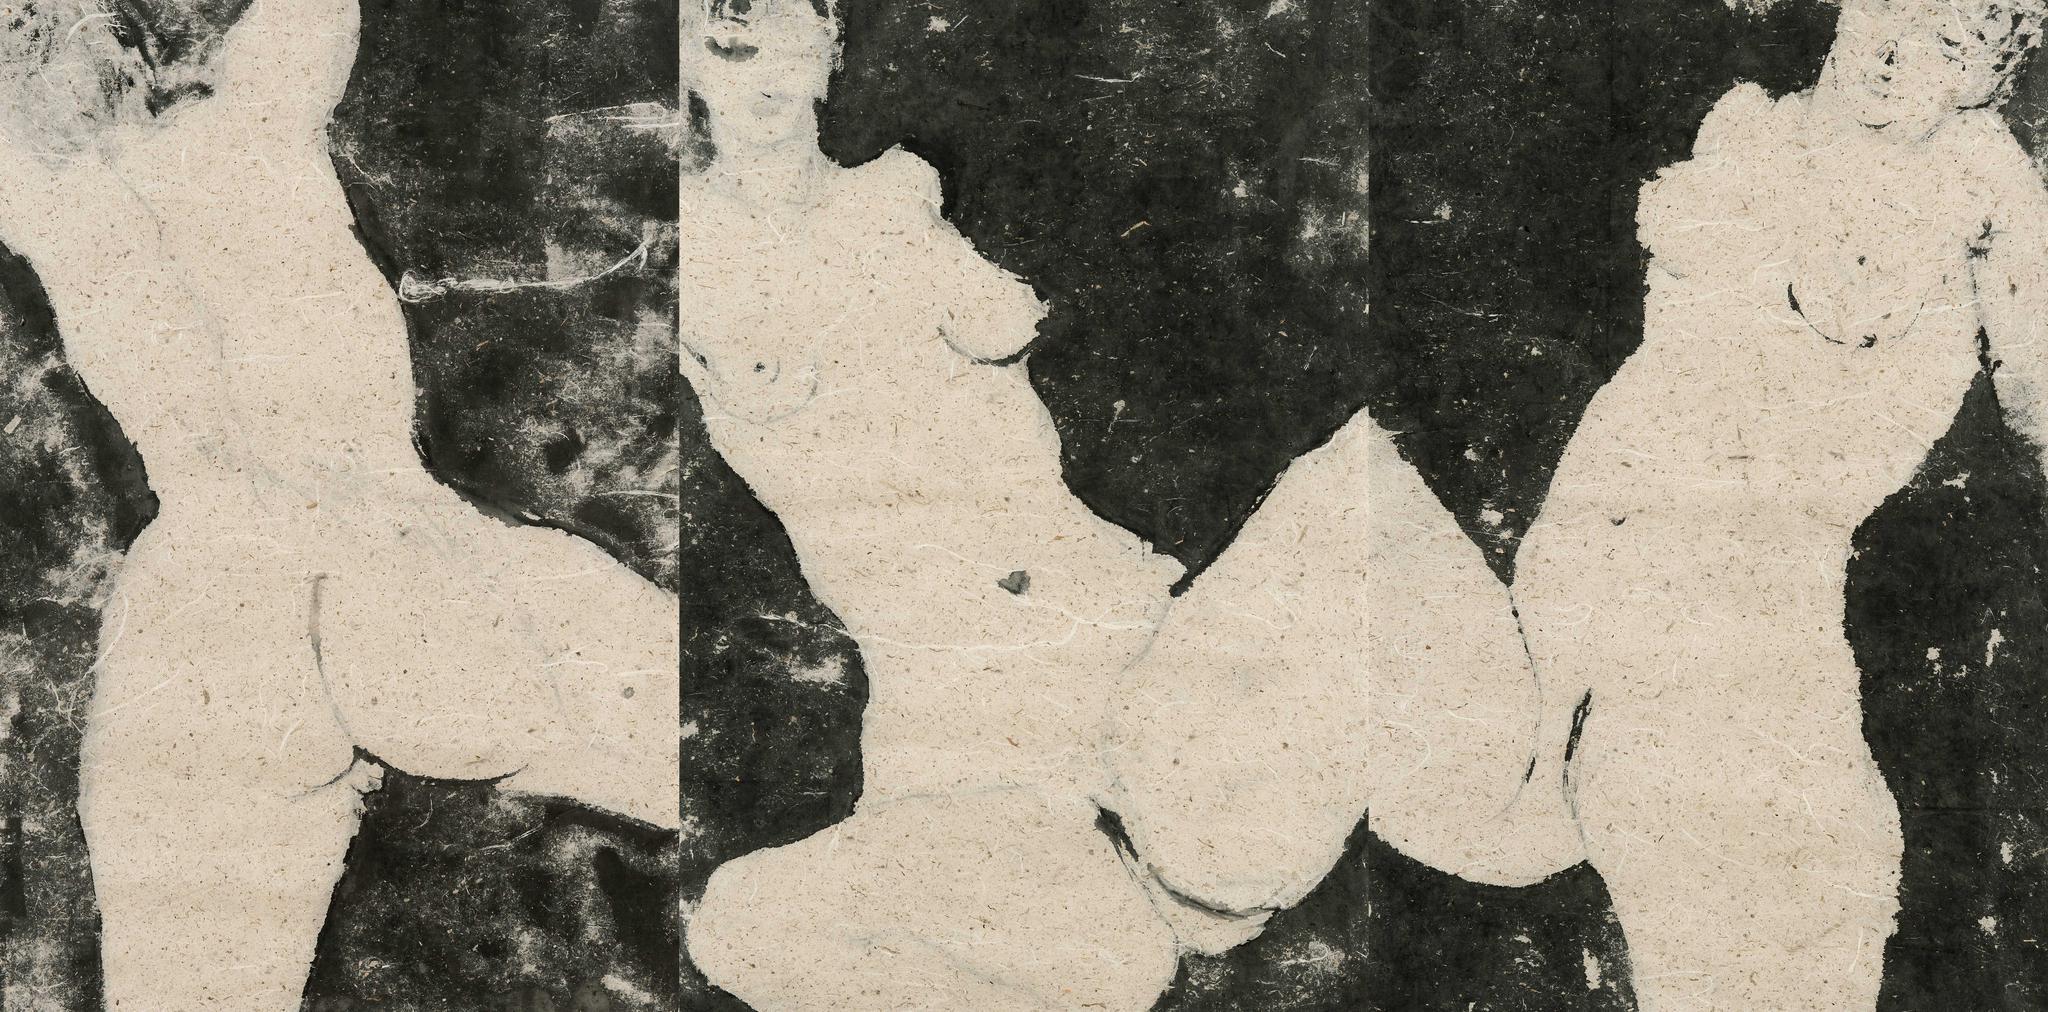 女人的痕迹 Traces de femmes   苏菲